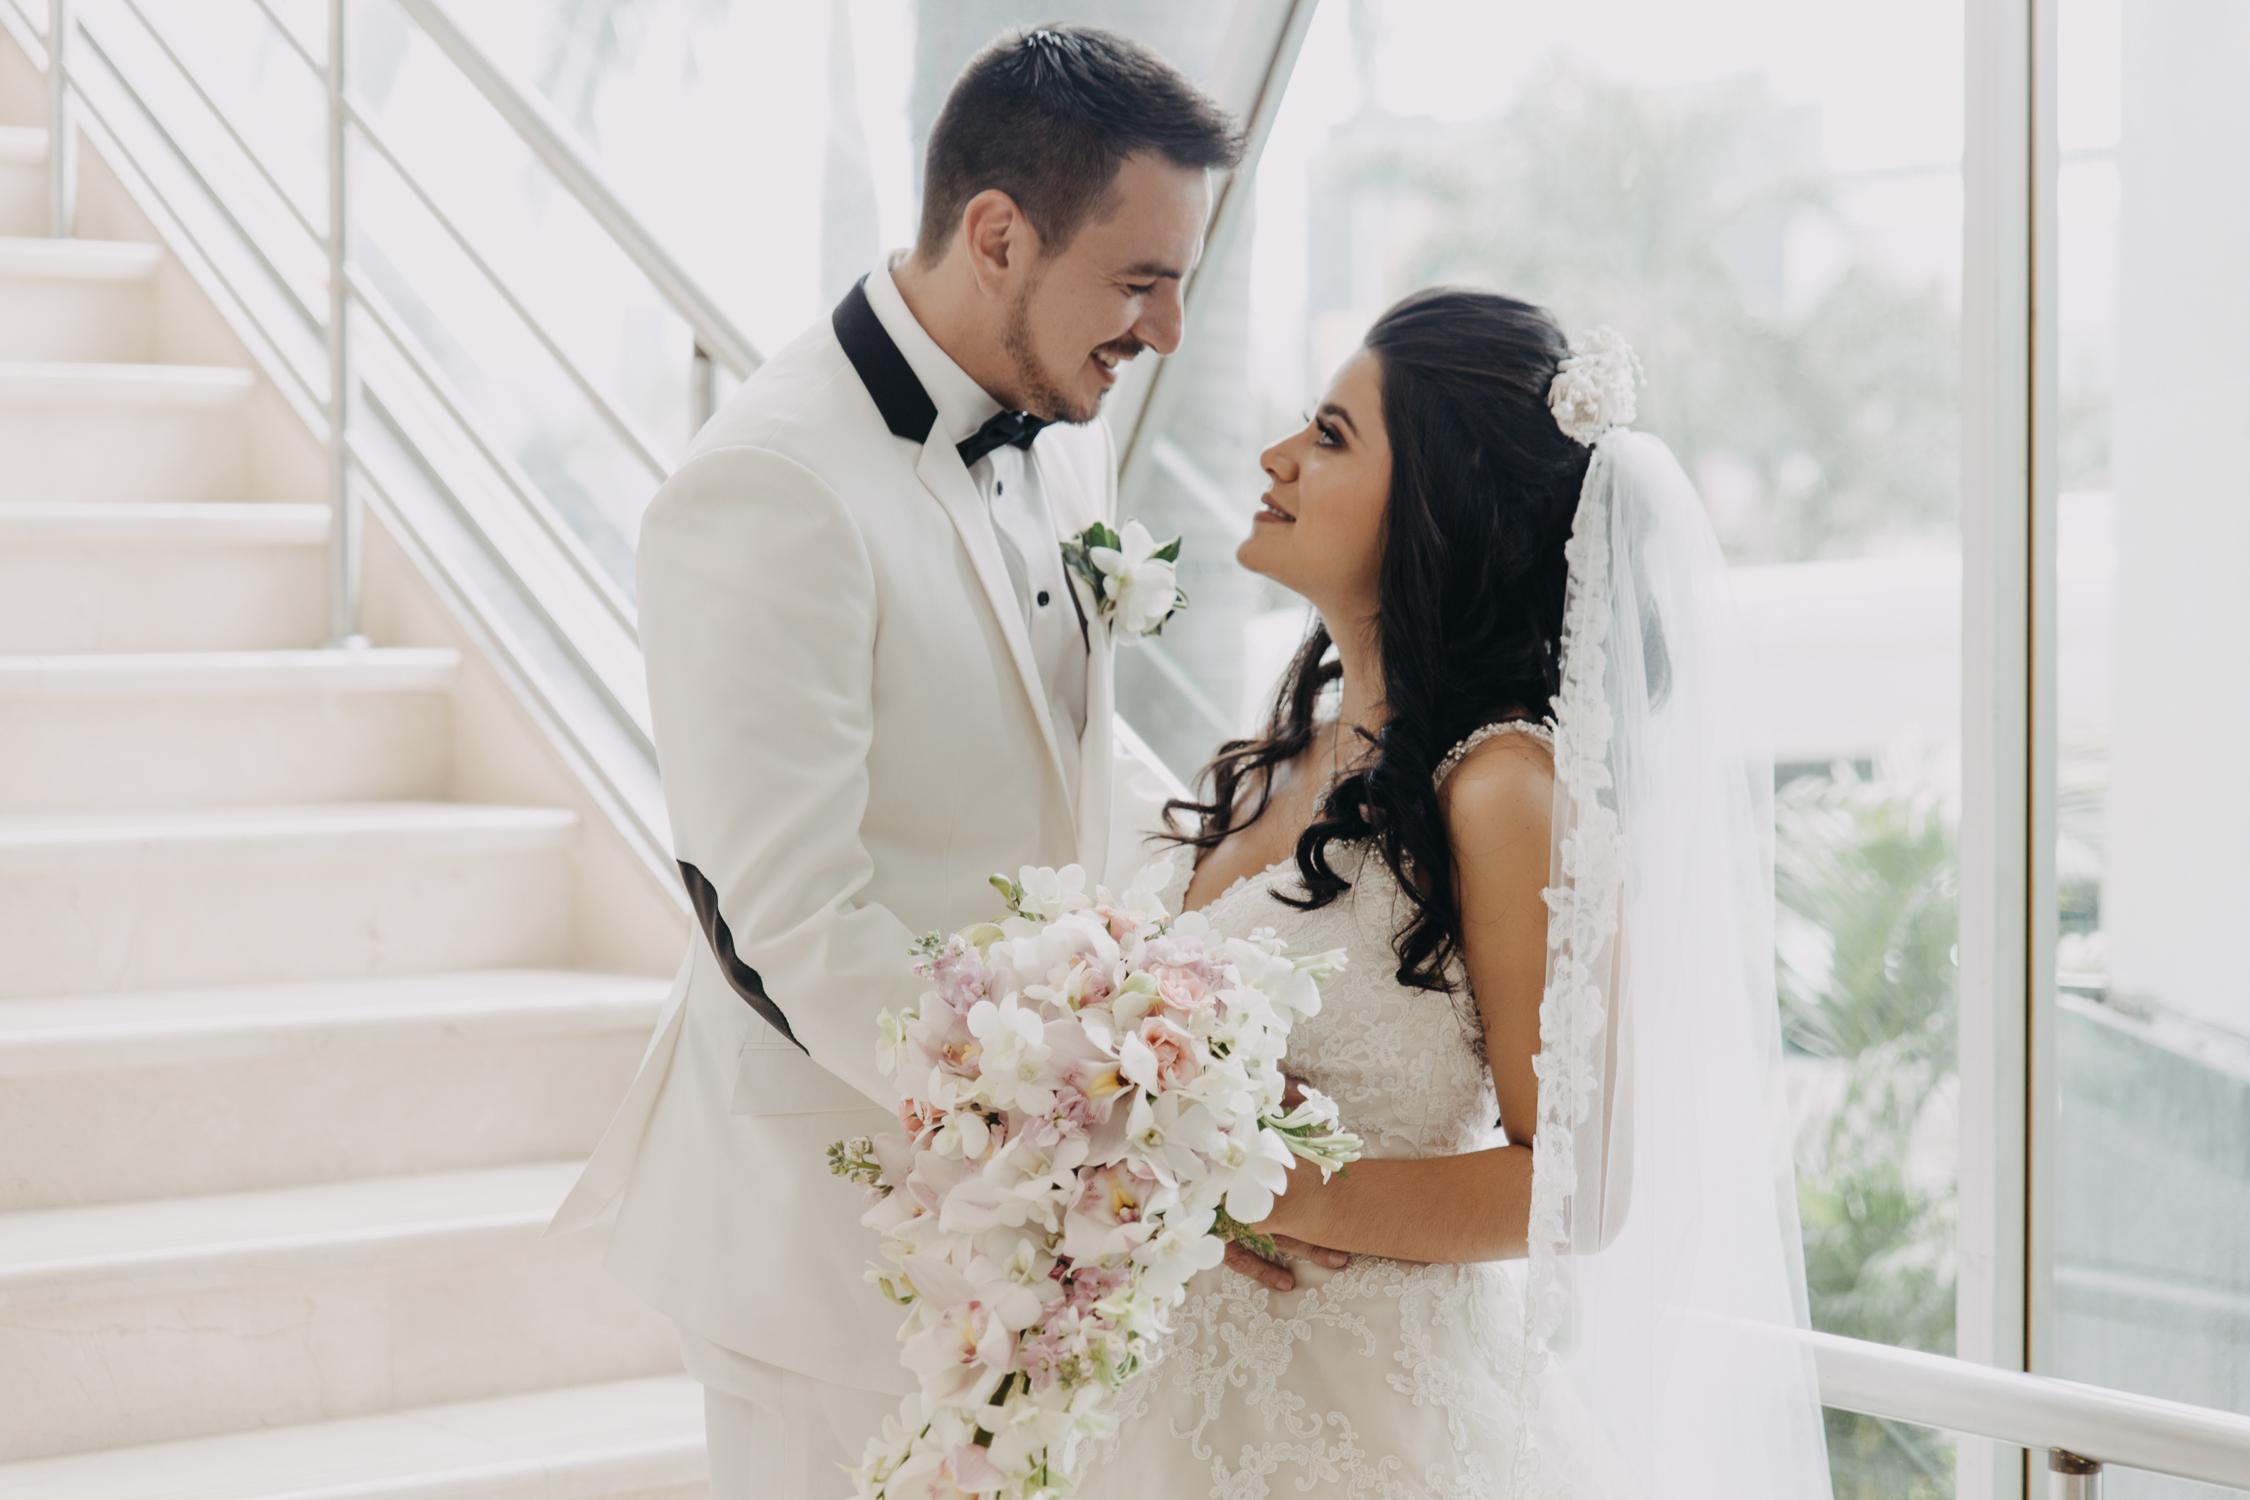 Michelle-Agurto-Fotografia-Bodas-Ecuador-Destination-Wedding-Photographer-Daniela-Dirk-35.JPG